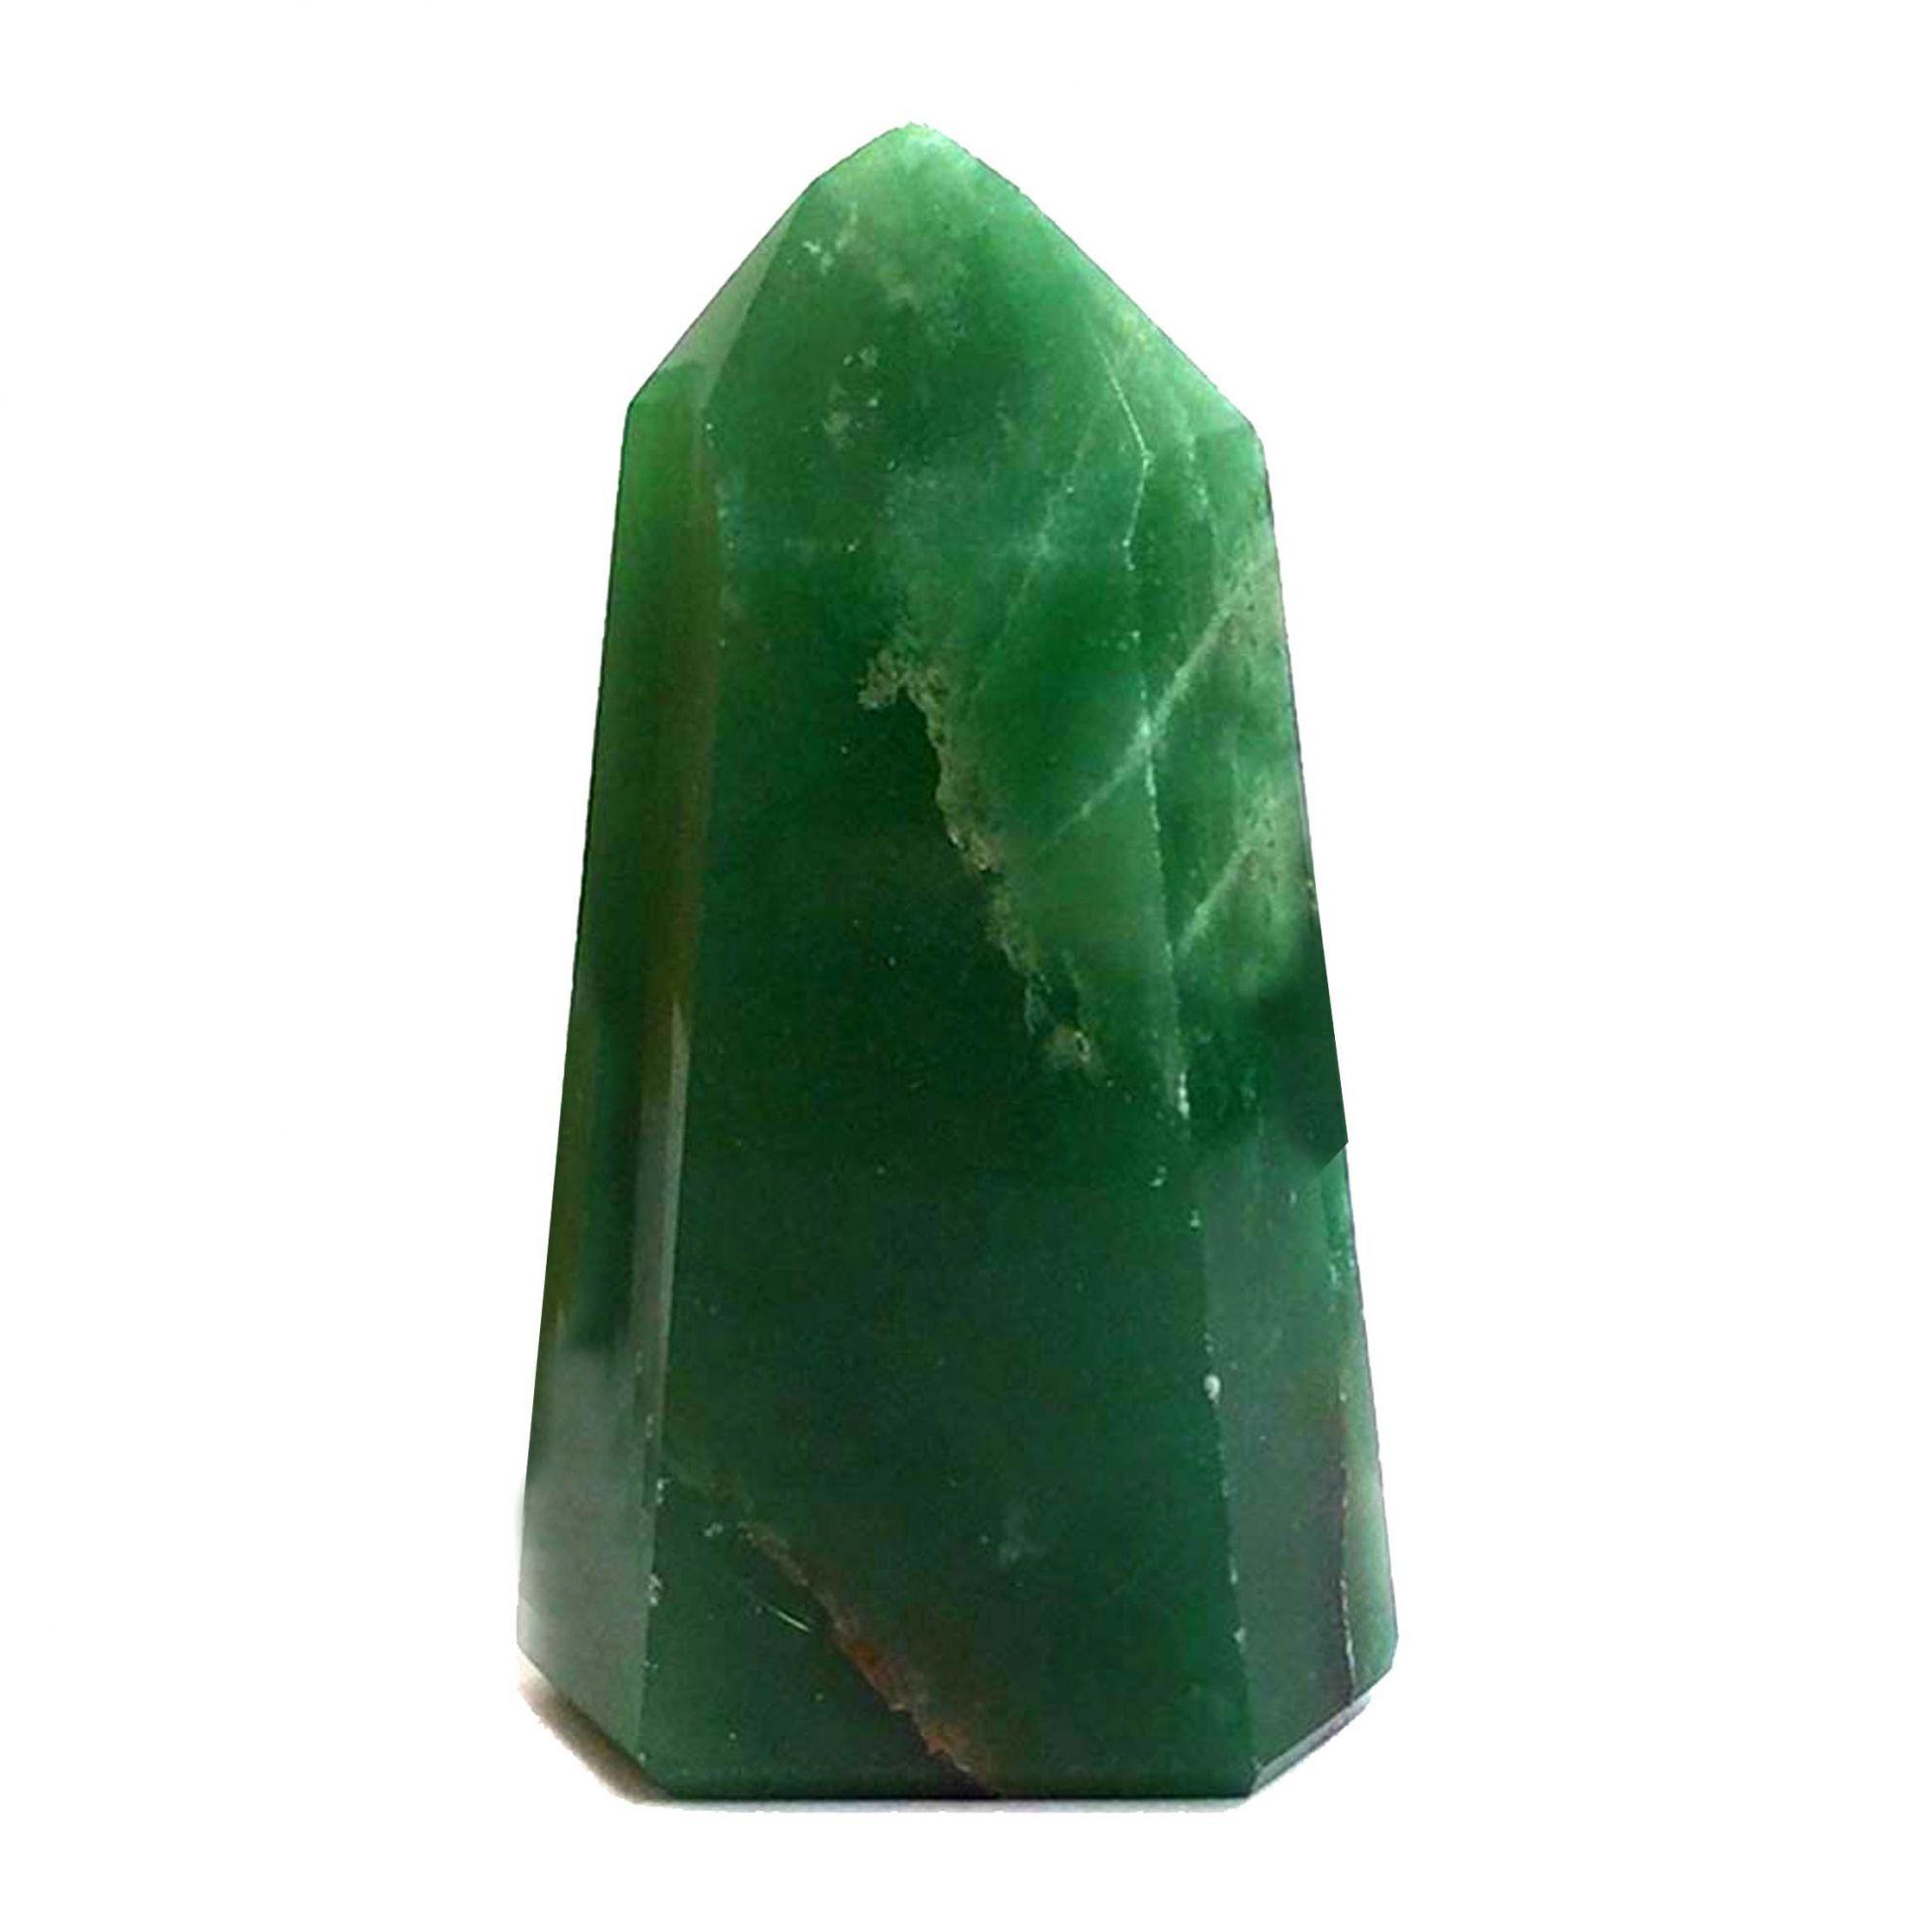 Ponta Natural Cristal Pedra Quartzo Verde Cura Energia